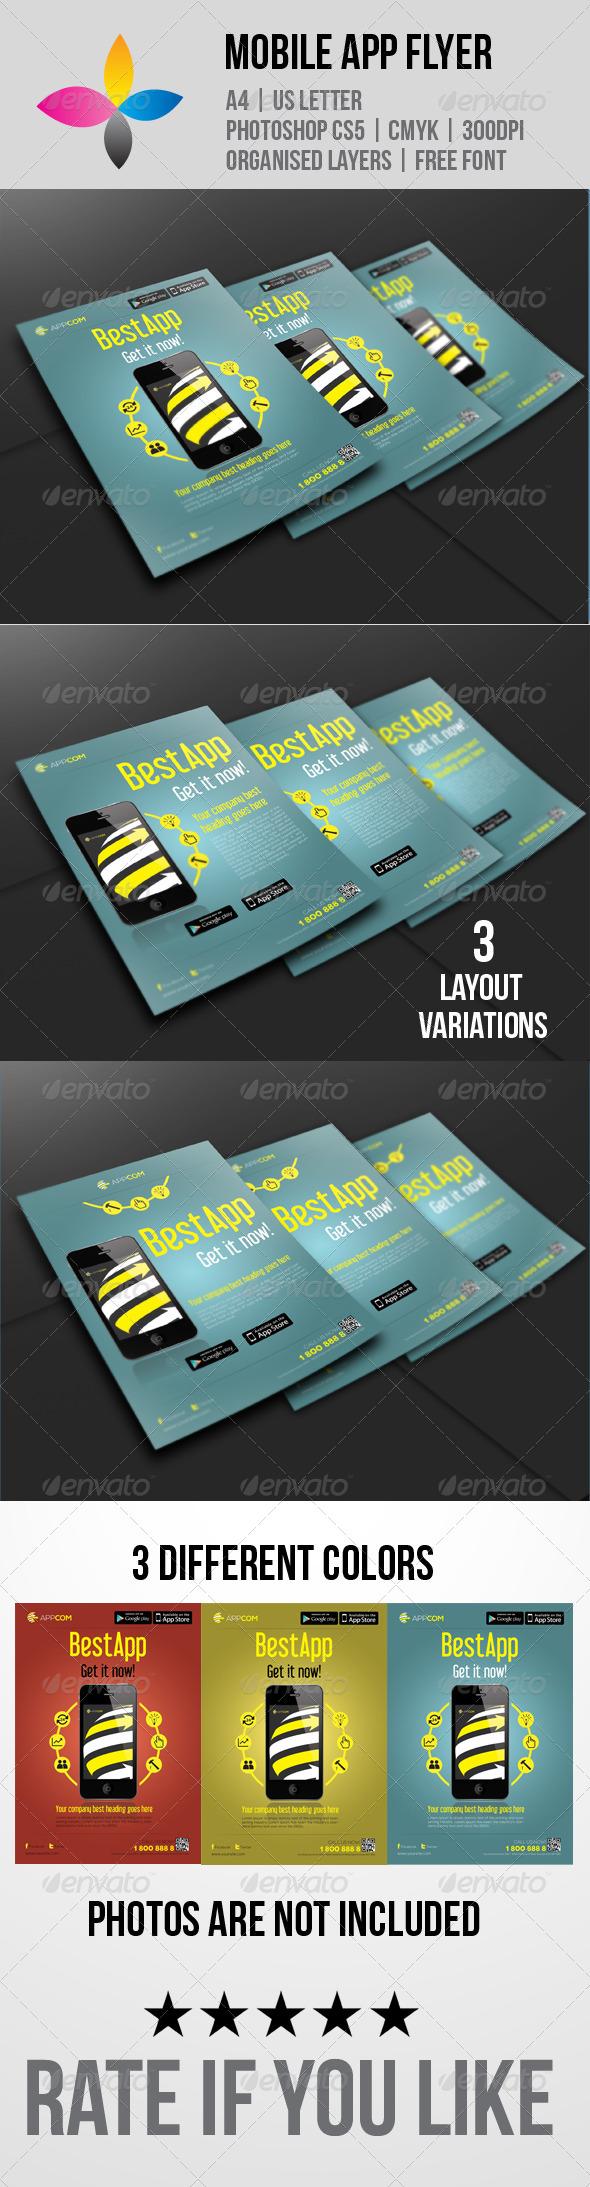 GraphicRiver Mobile App Flyer 5829263